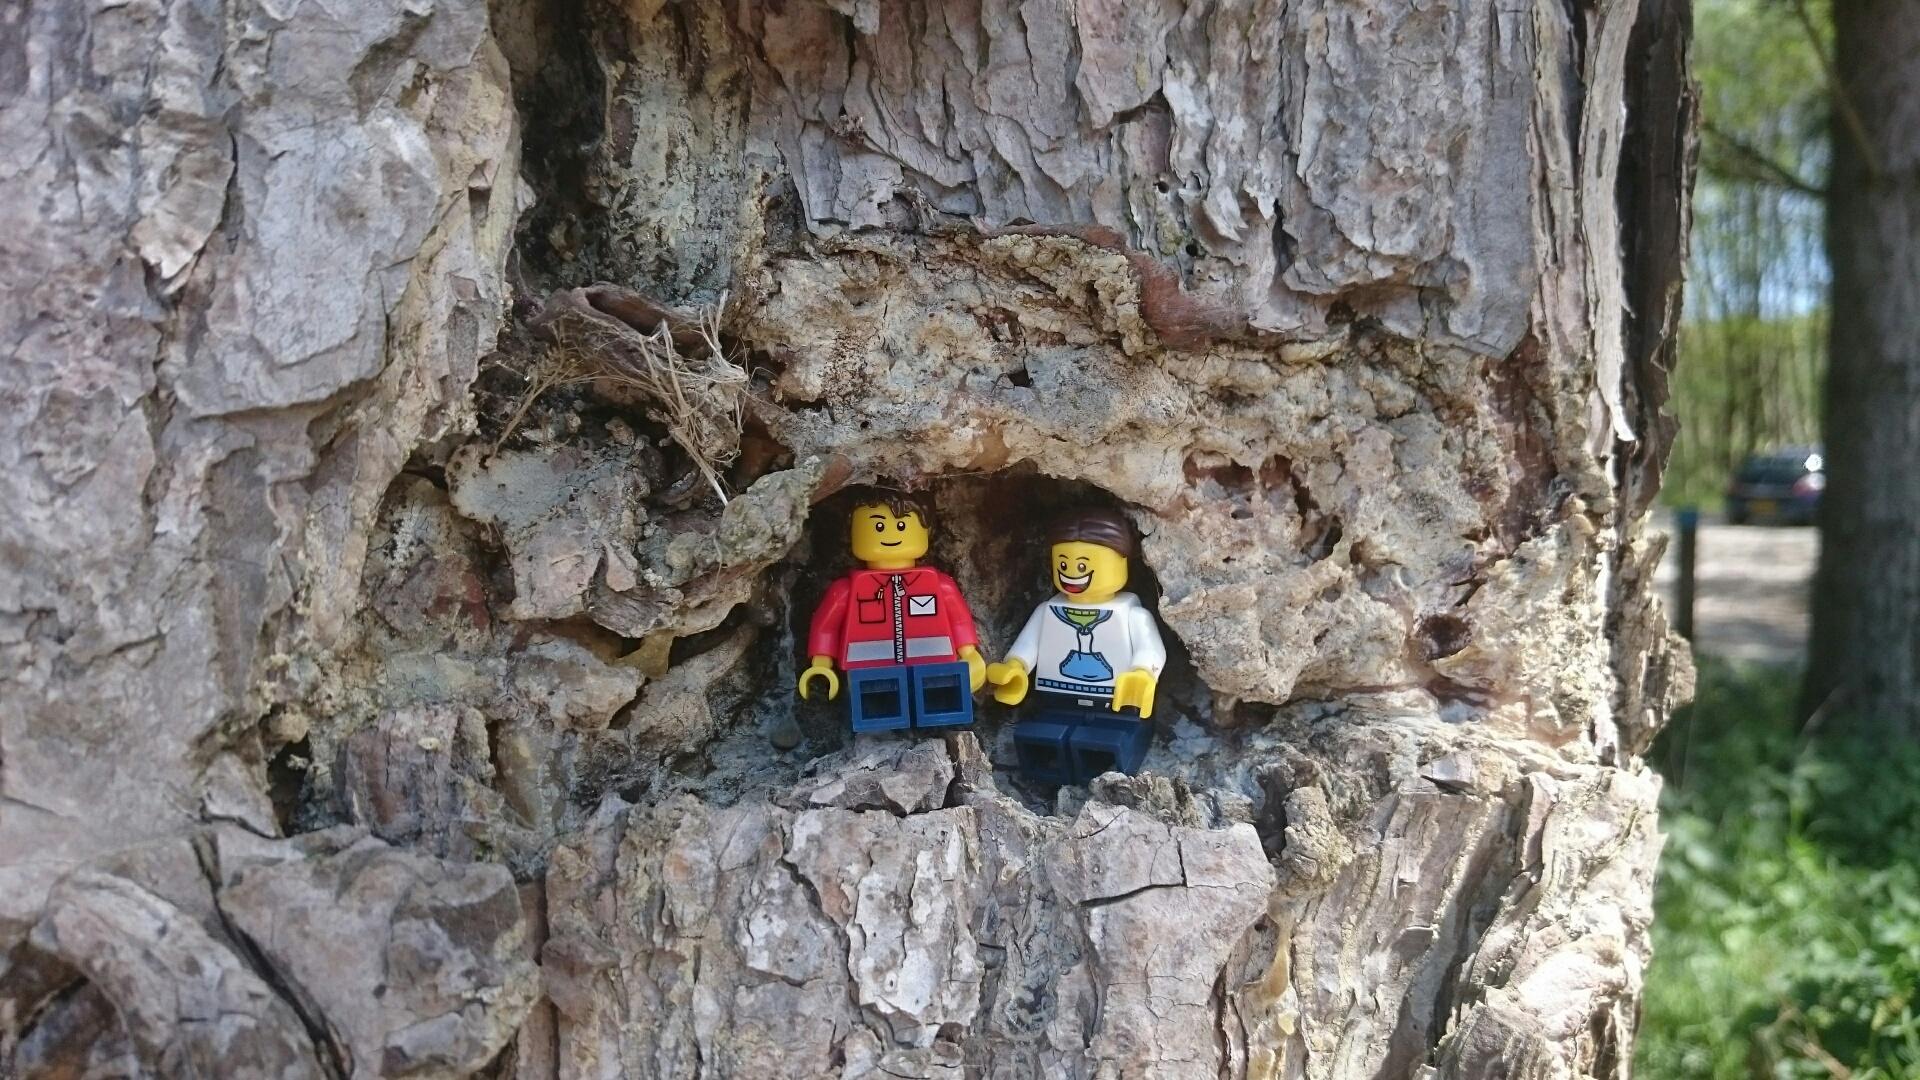 Lego Mini figures in a tree